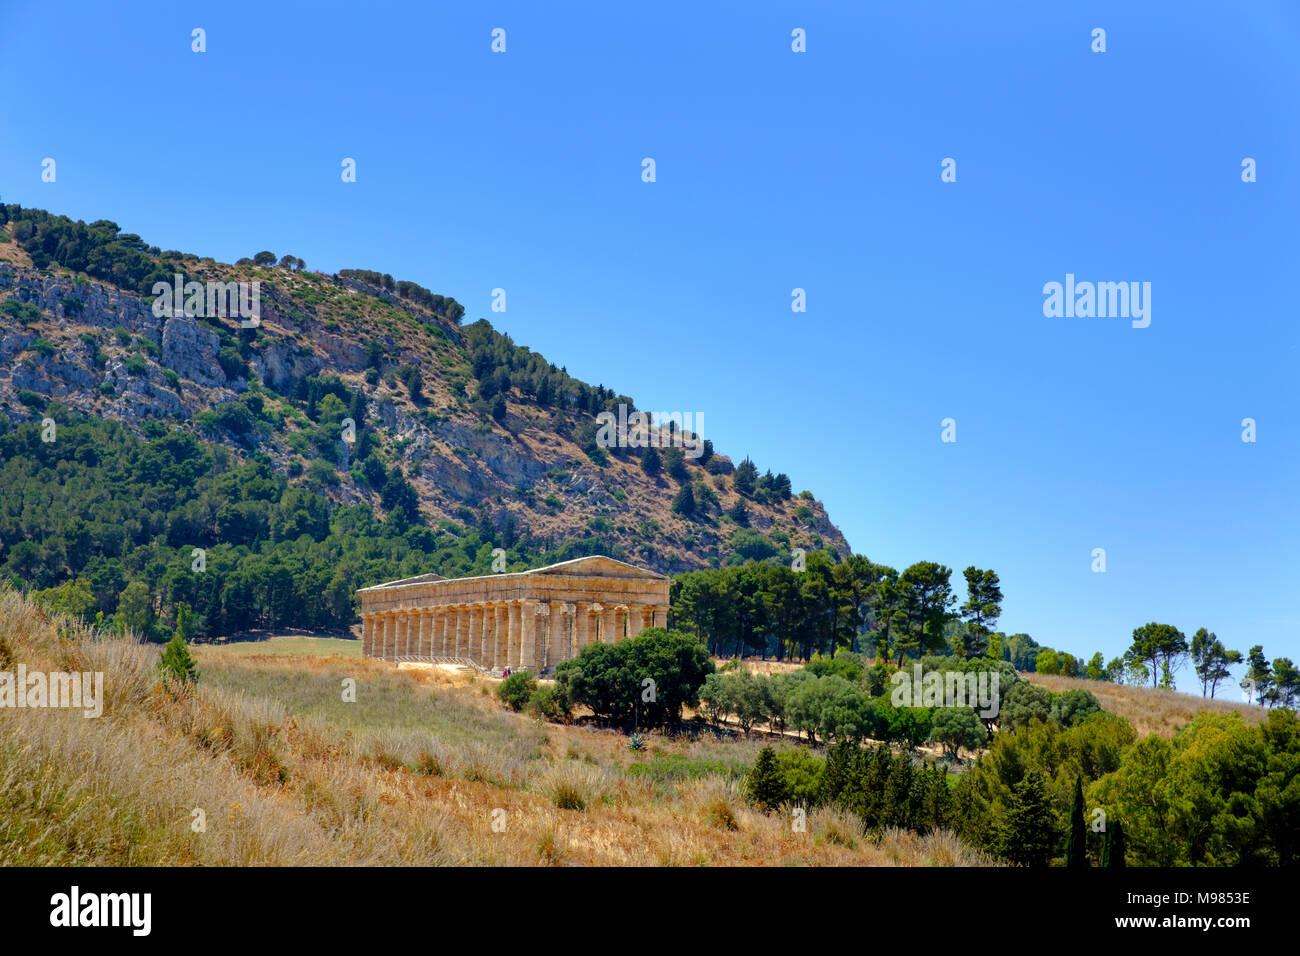 griechische Tempelanlage Segesta, Provinz Trapani, Sizilien, Italien - Stock Image